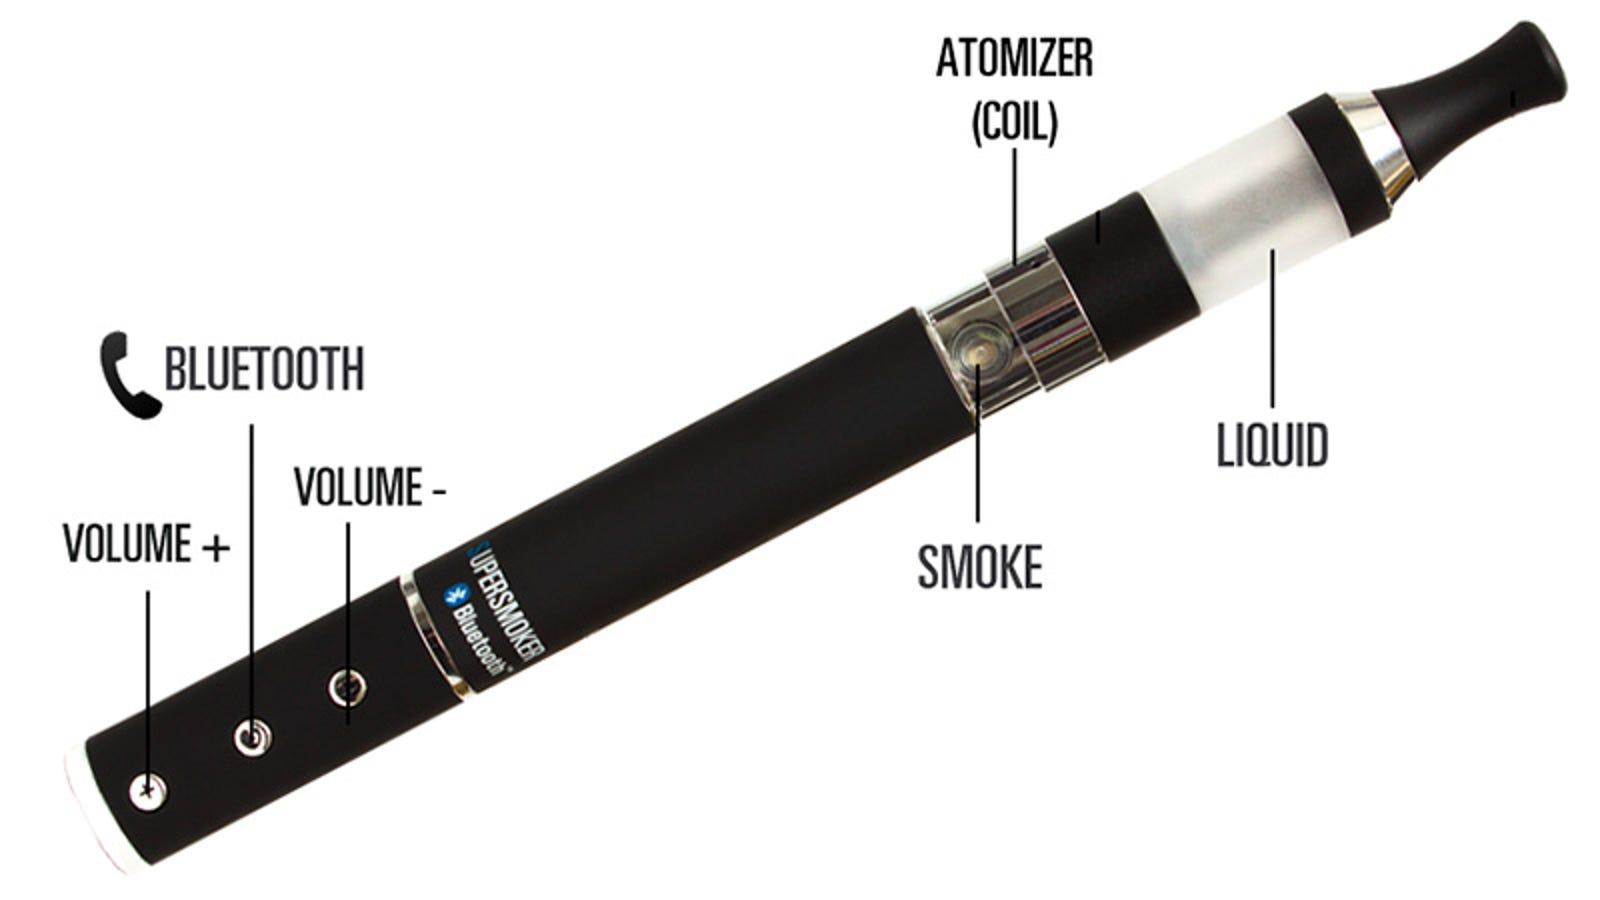 A Bluetooth E-Cigarette That Doubles As a Speakerphone. Wait, What?